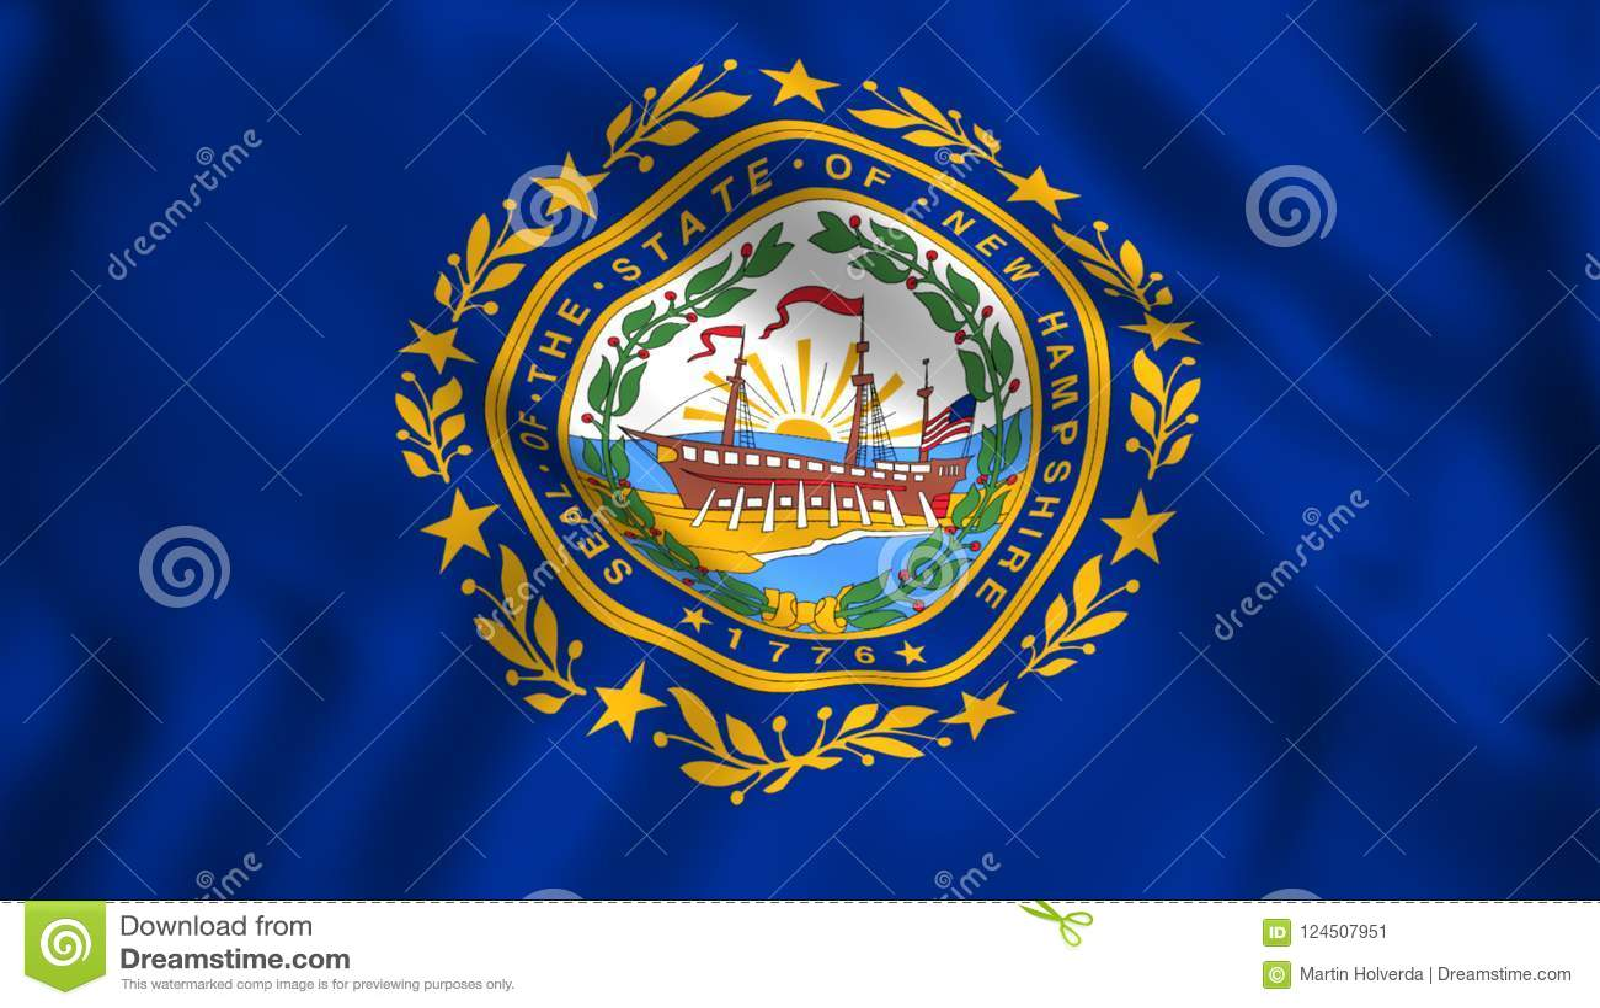 Flag New Hampshire Us State Stock Illustration Illustration Of